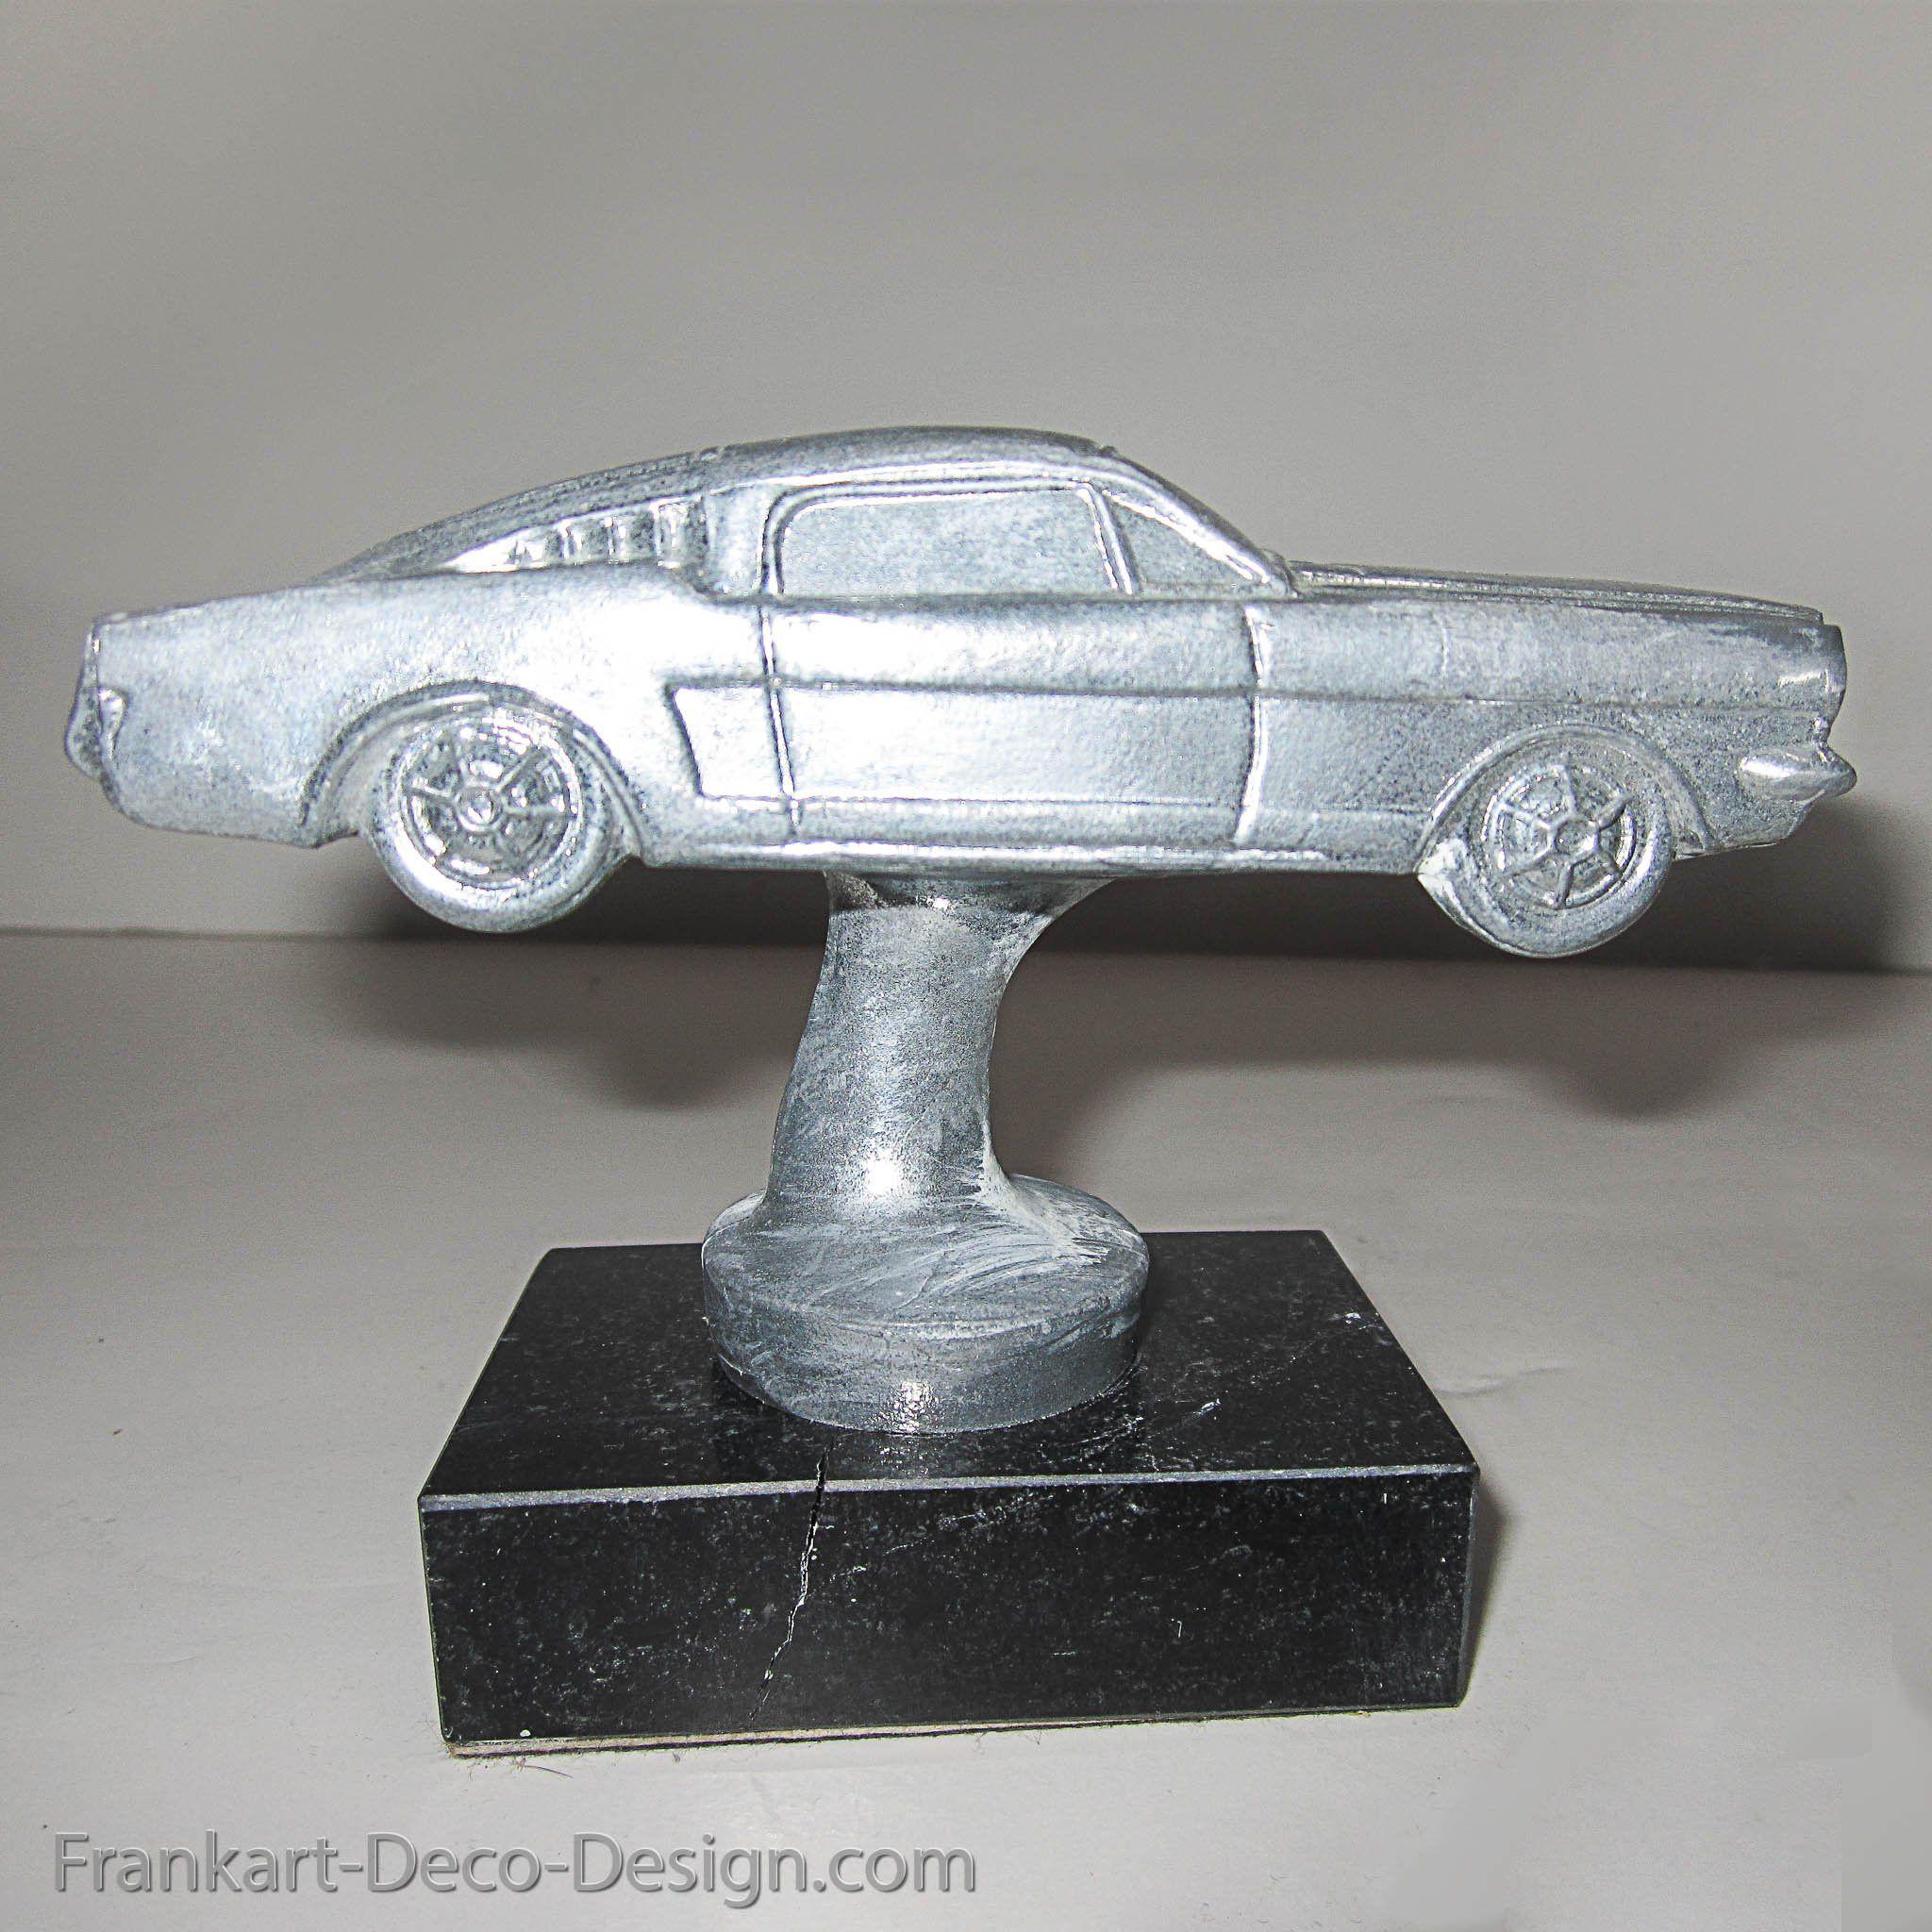 1963 1964 1965 Ford Mustang Fastback Aluminum Hood Ornament Hood